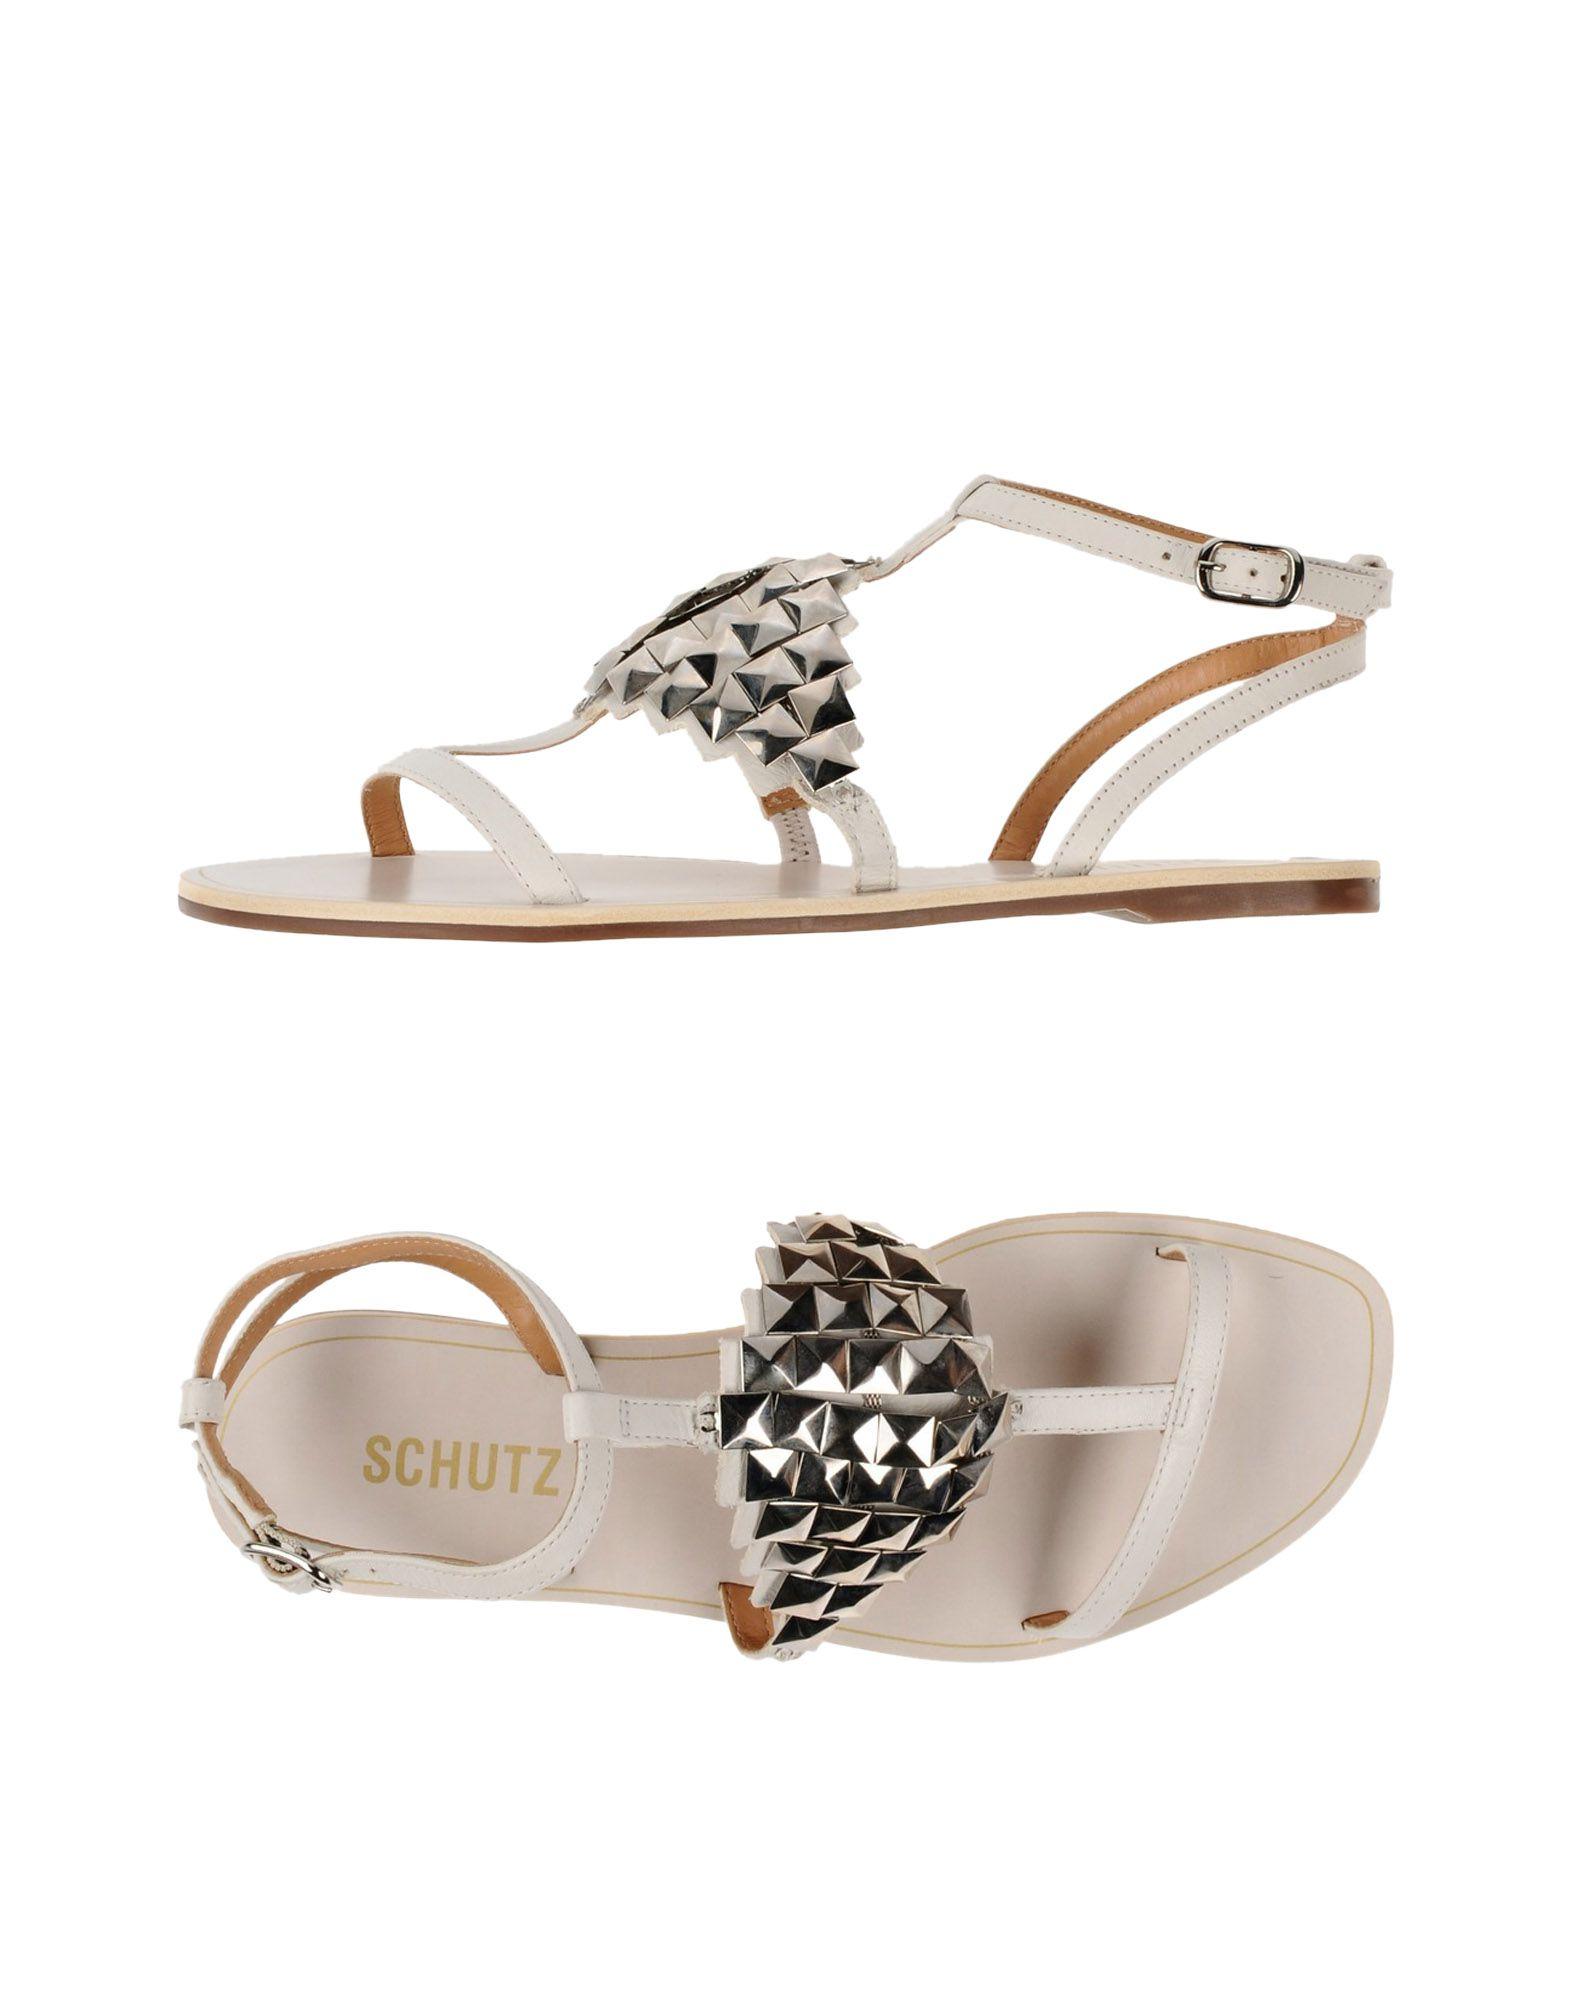 Sandales Schutz Femme - Sandales Schutz sur